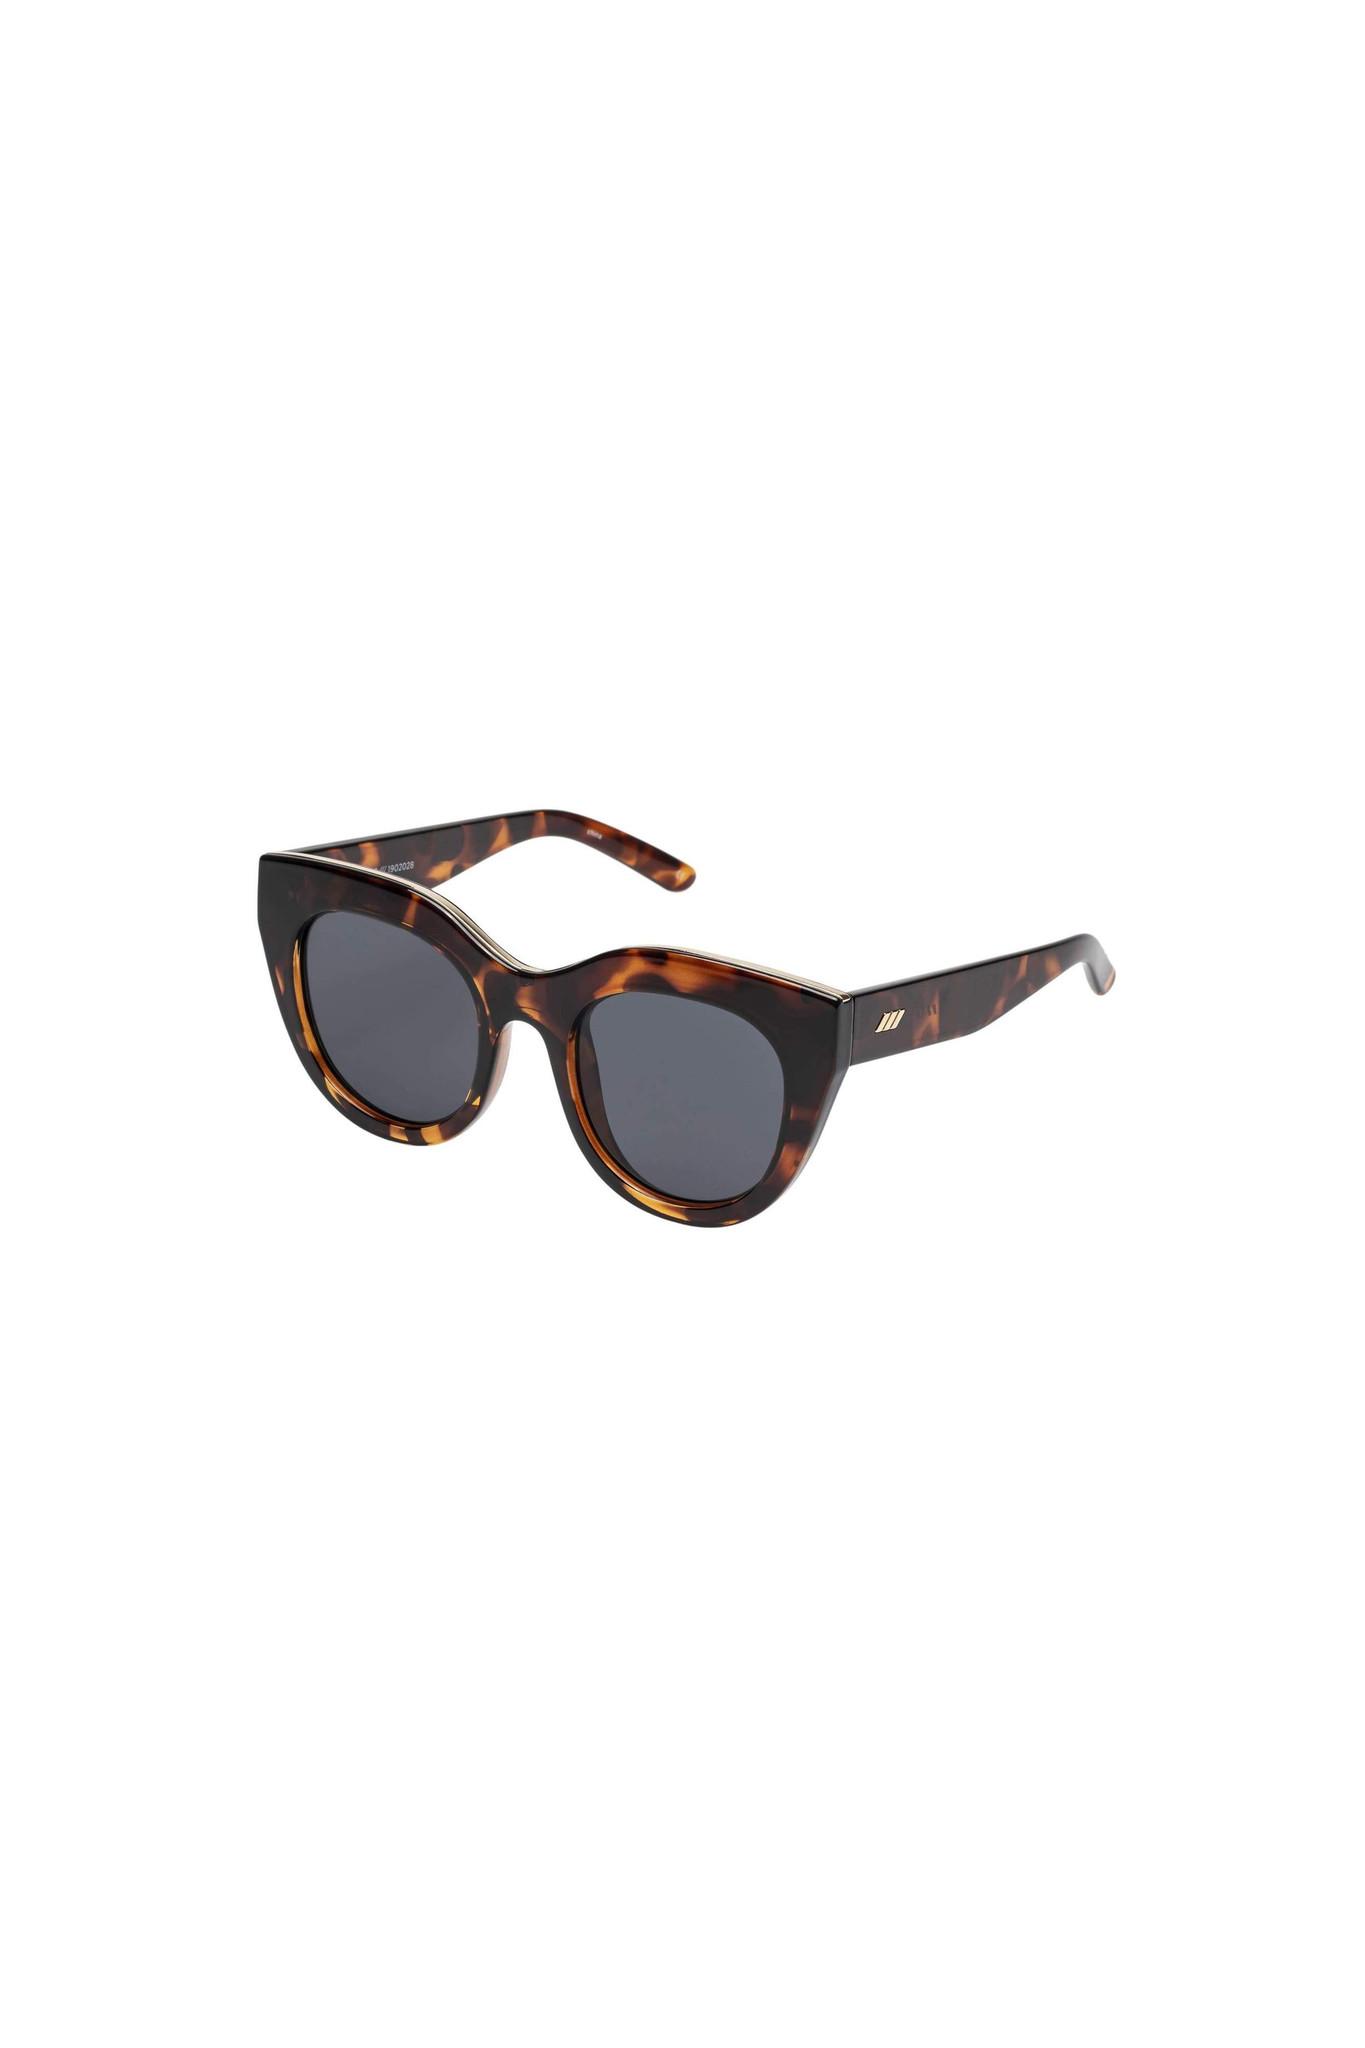 Le Specs Air Heart Sunglasses - Tortoise